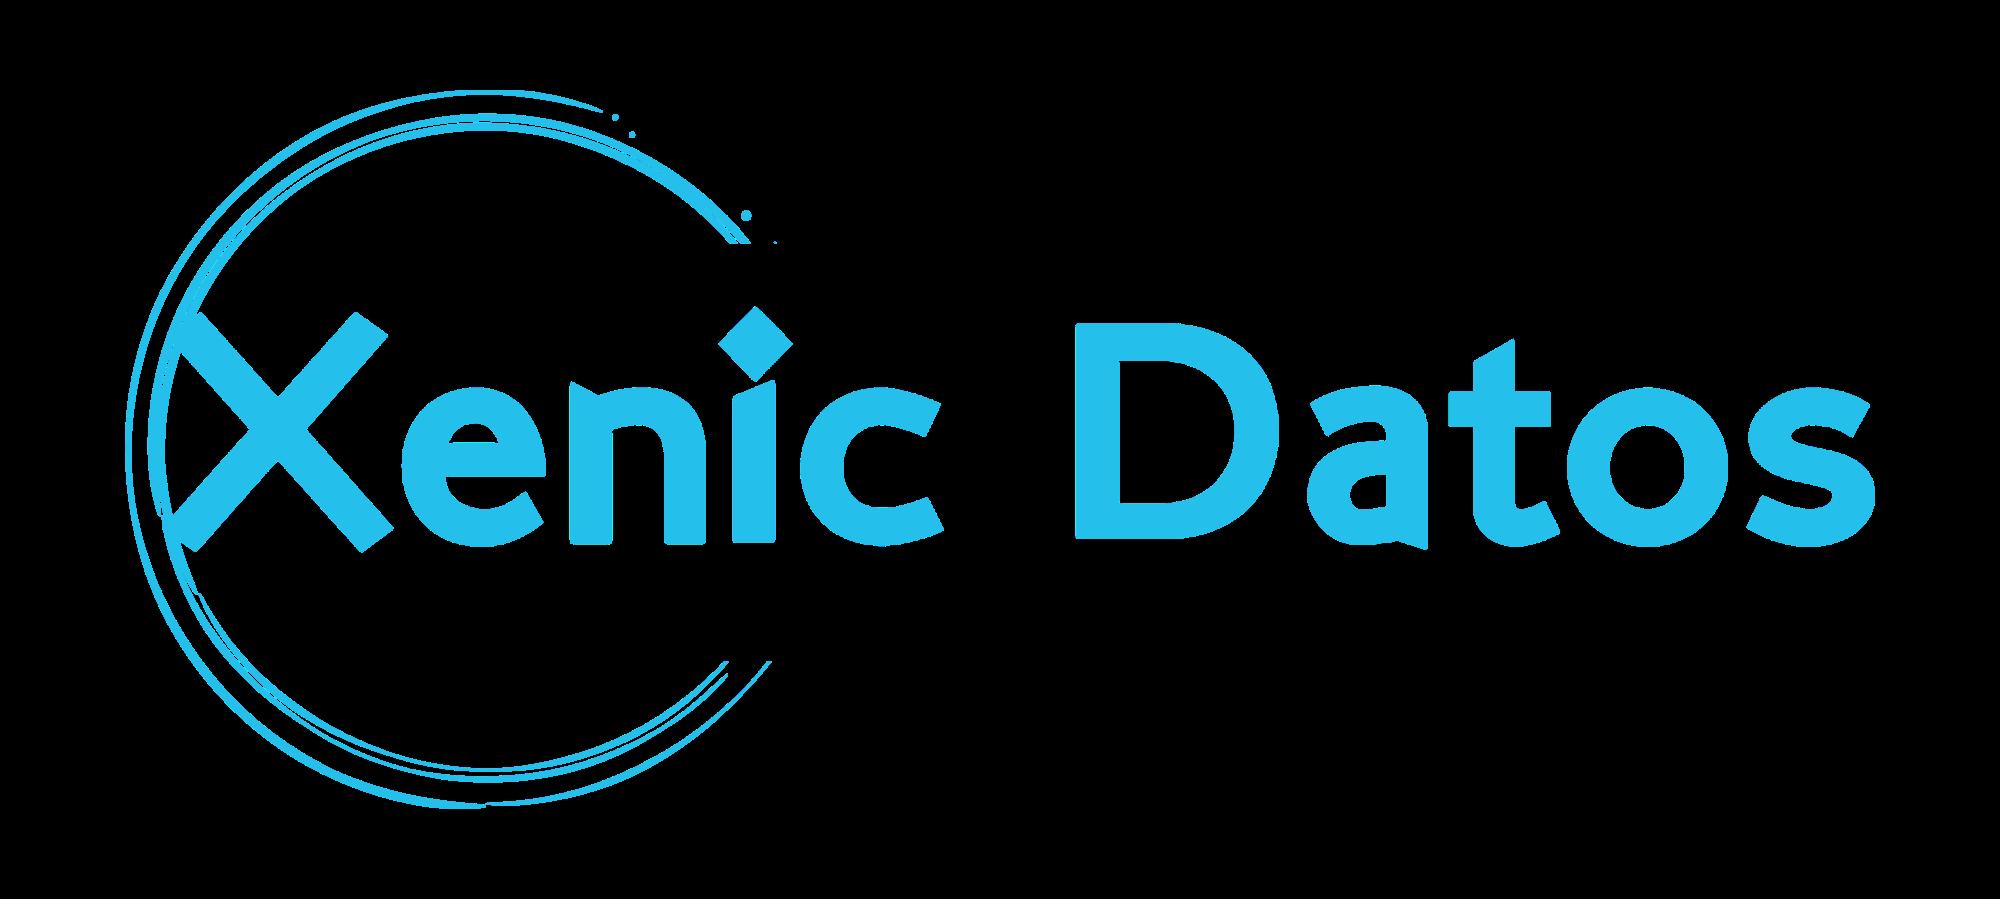 Xenic Datos